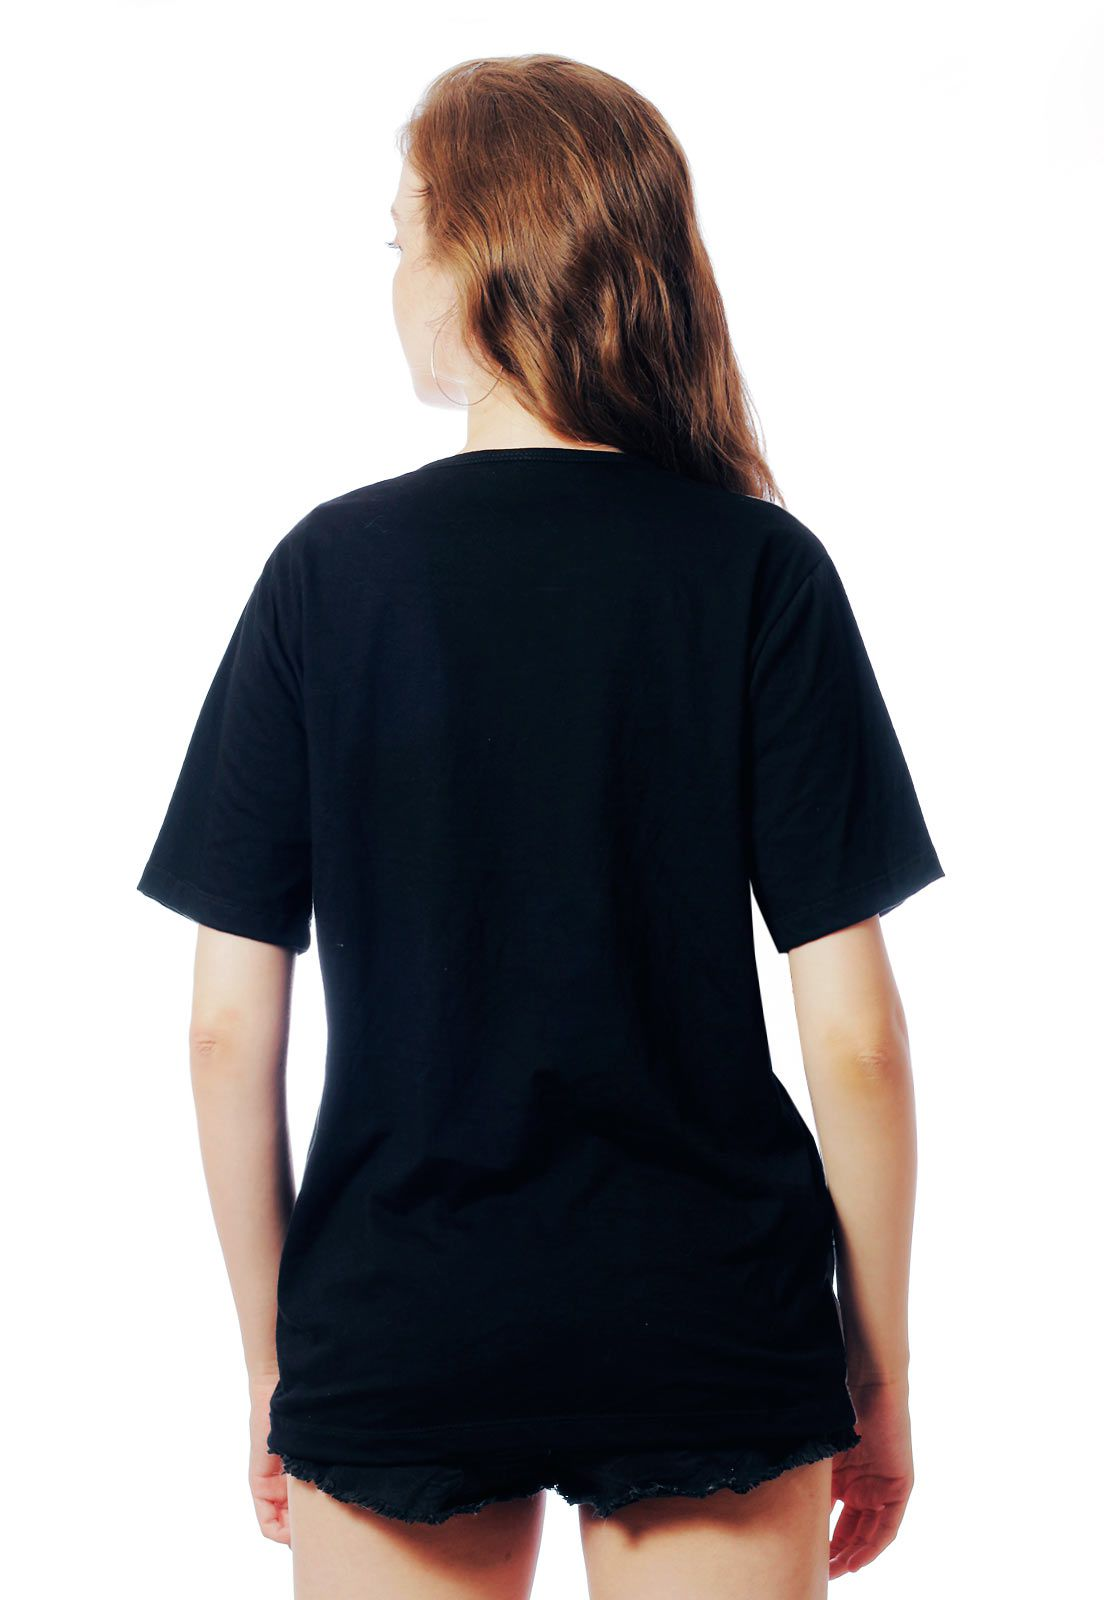 Camiseta ElephunK Estampada Geek Pacman Atari Tumblr Preta